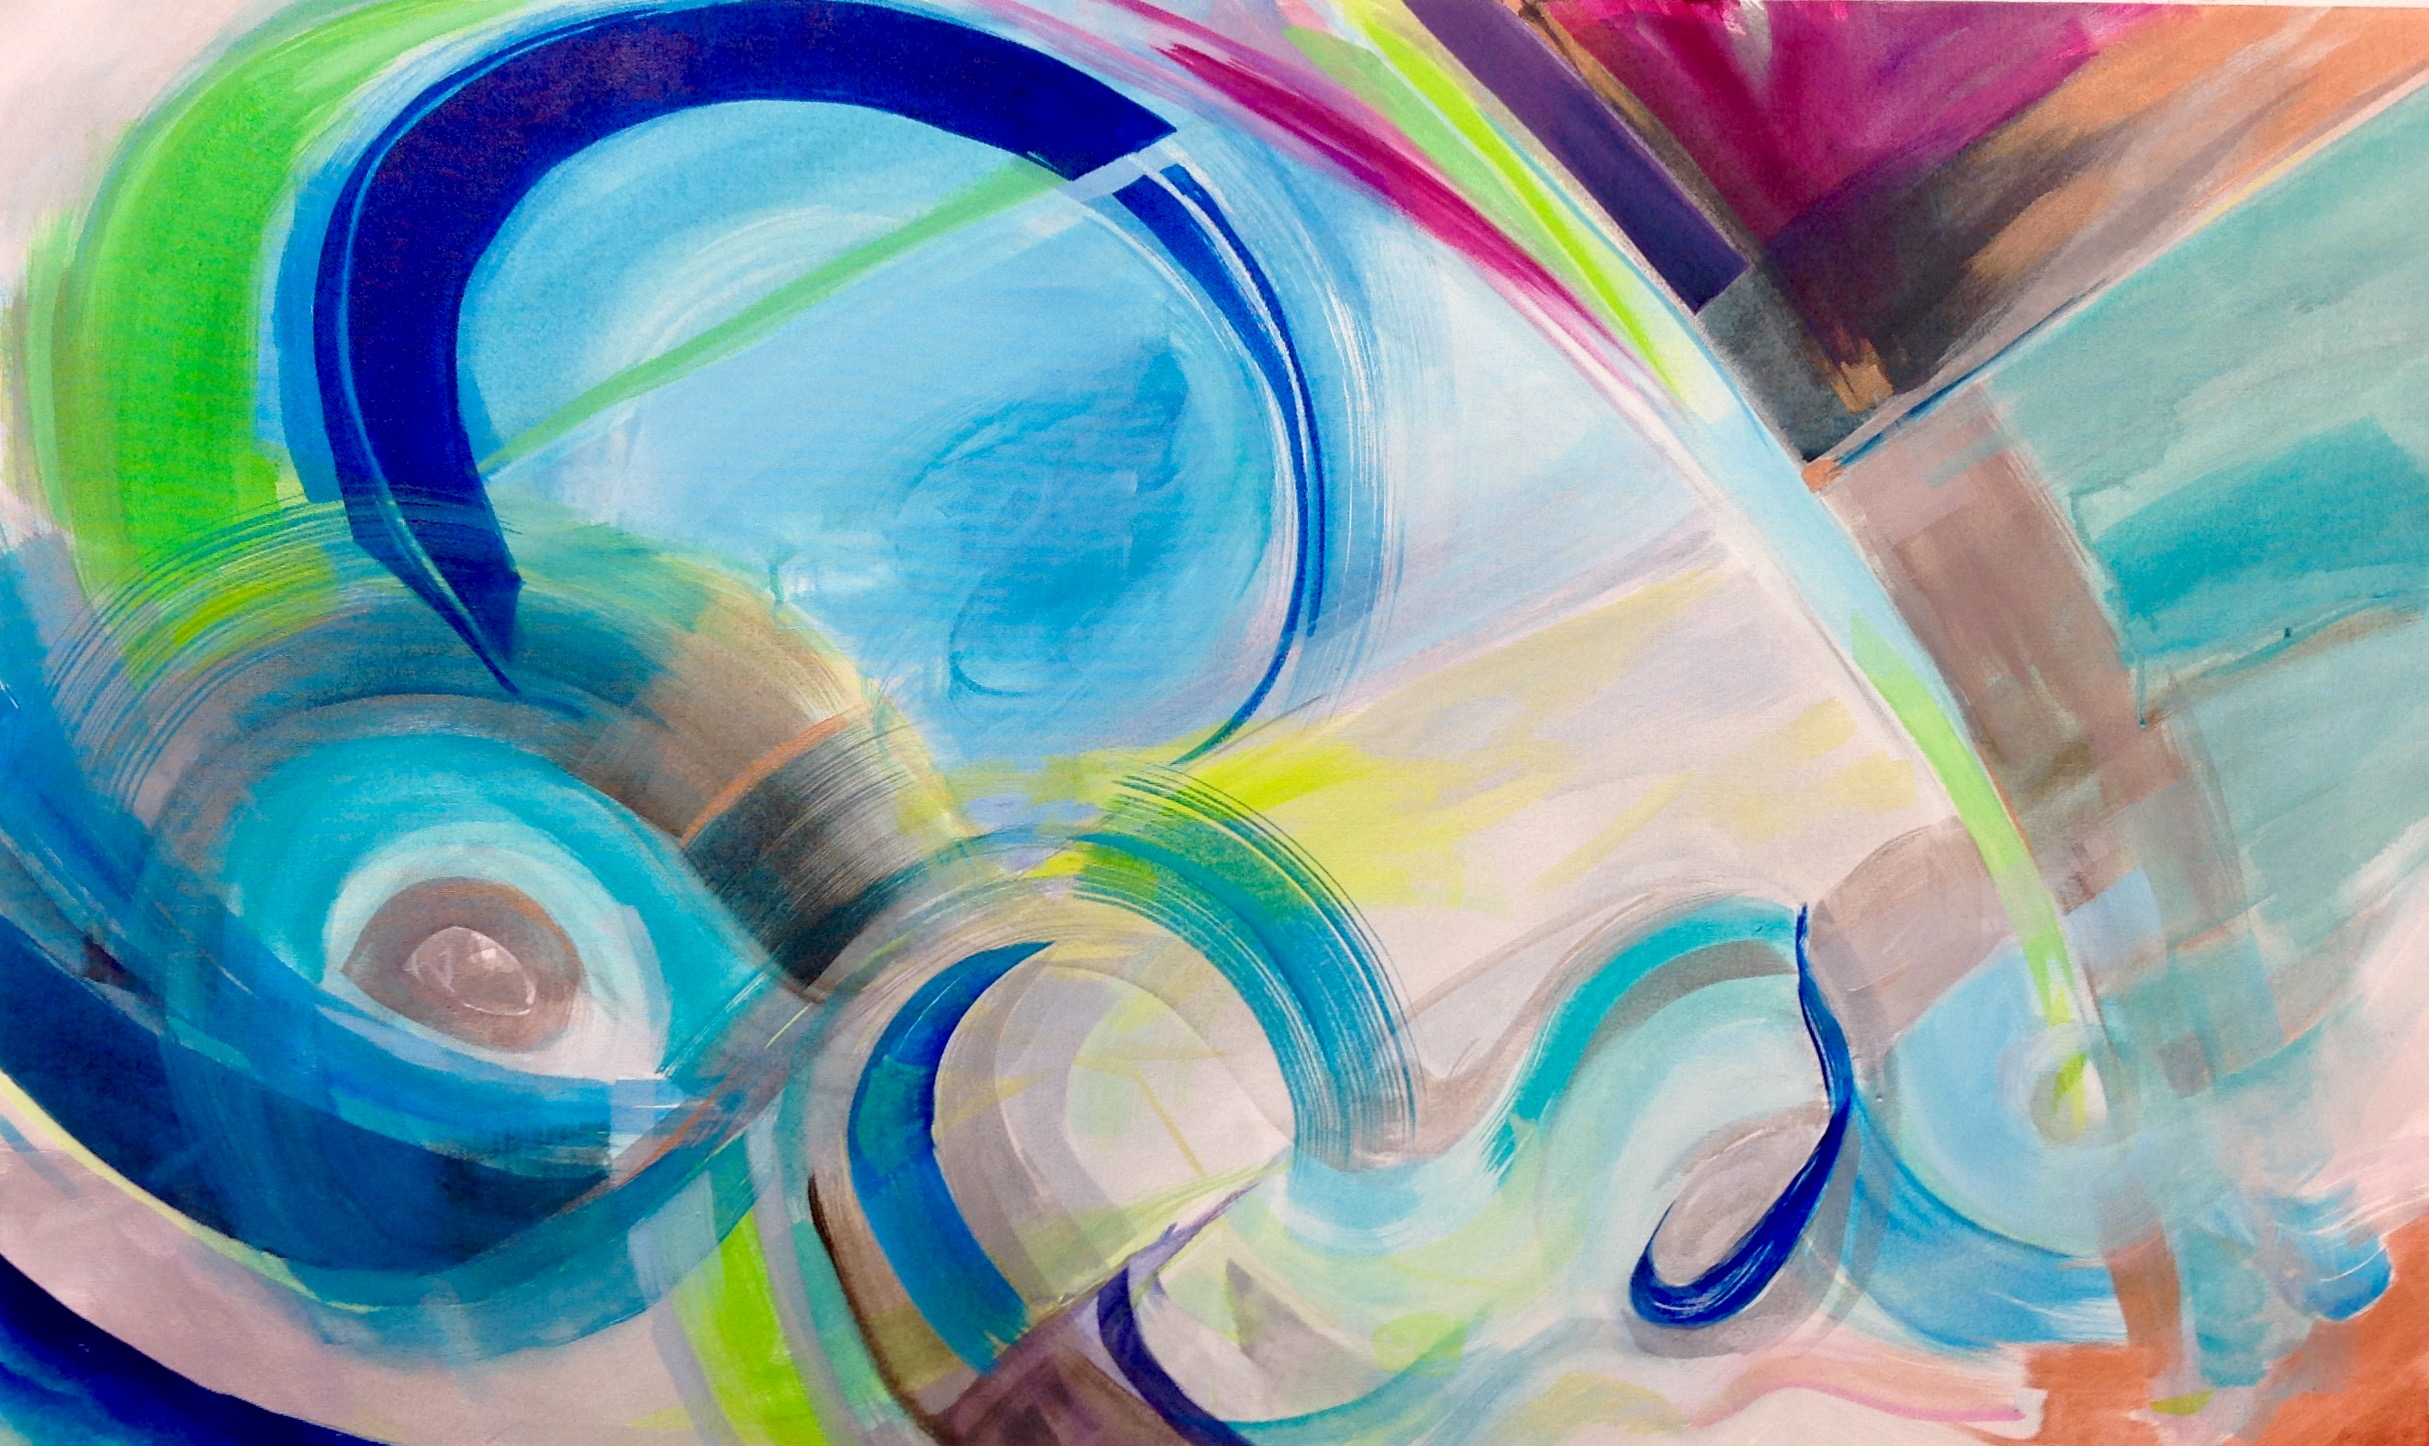 """Water's Light"", 2017 copyright, Kati Bujna, 30"" x 50"" x 2"", Acrylic, Graphite on canvas."